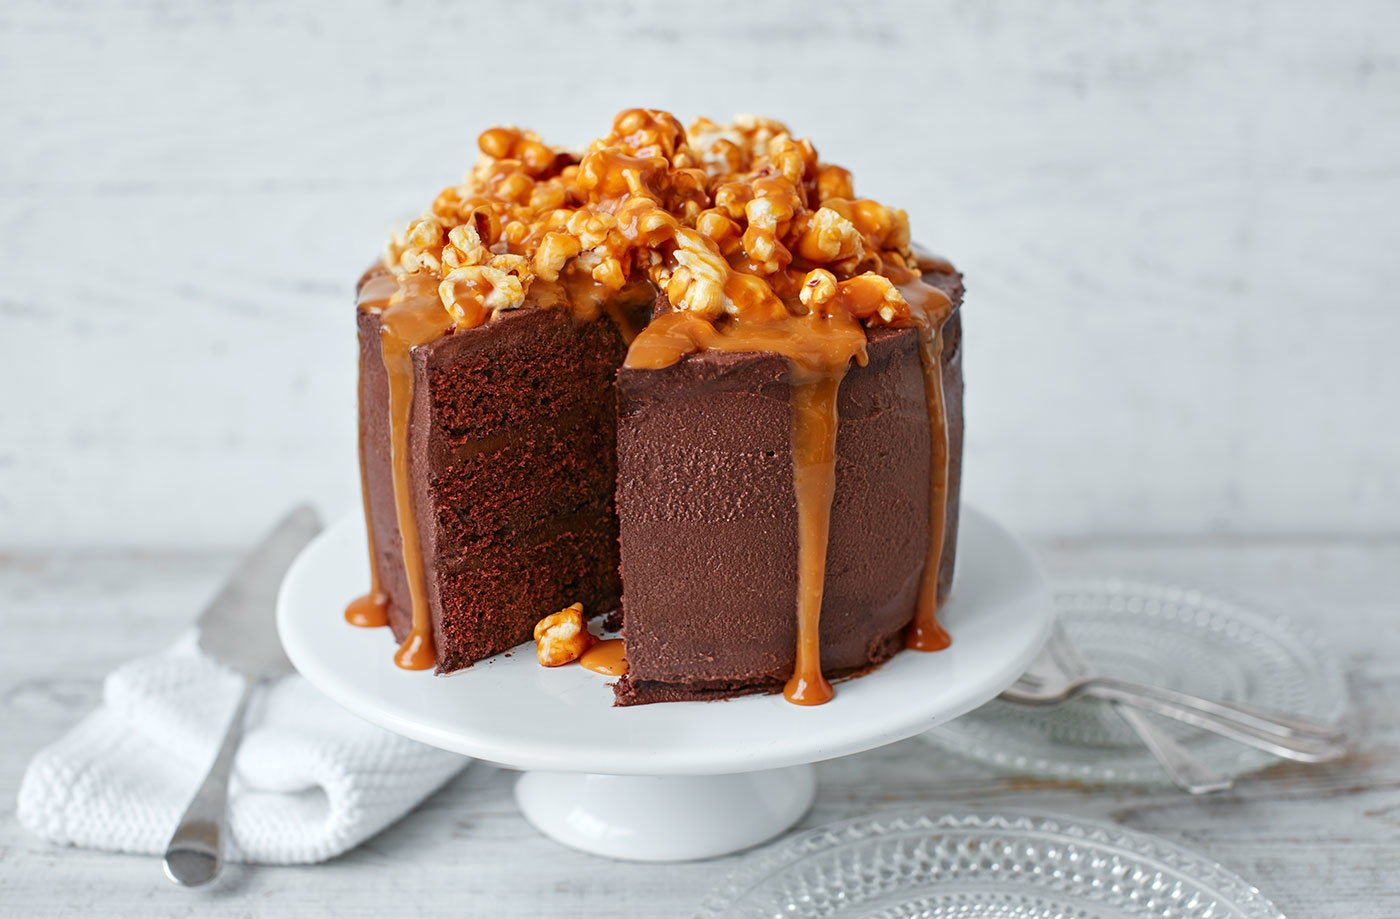 Chocolate Popcorn And Salted Caramel Cake